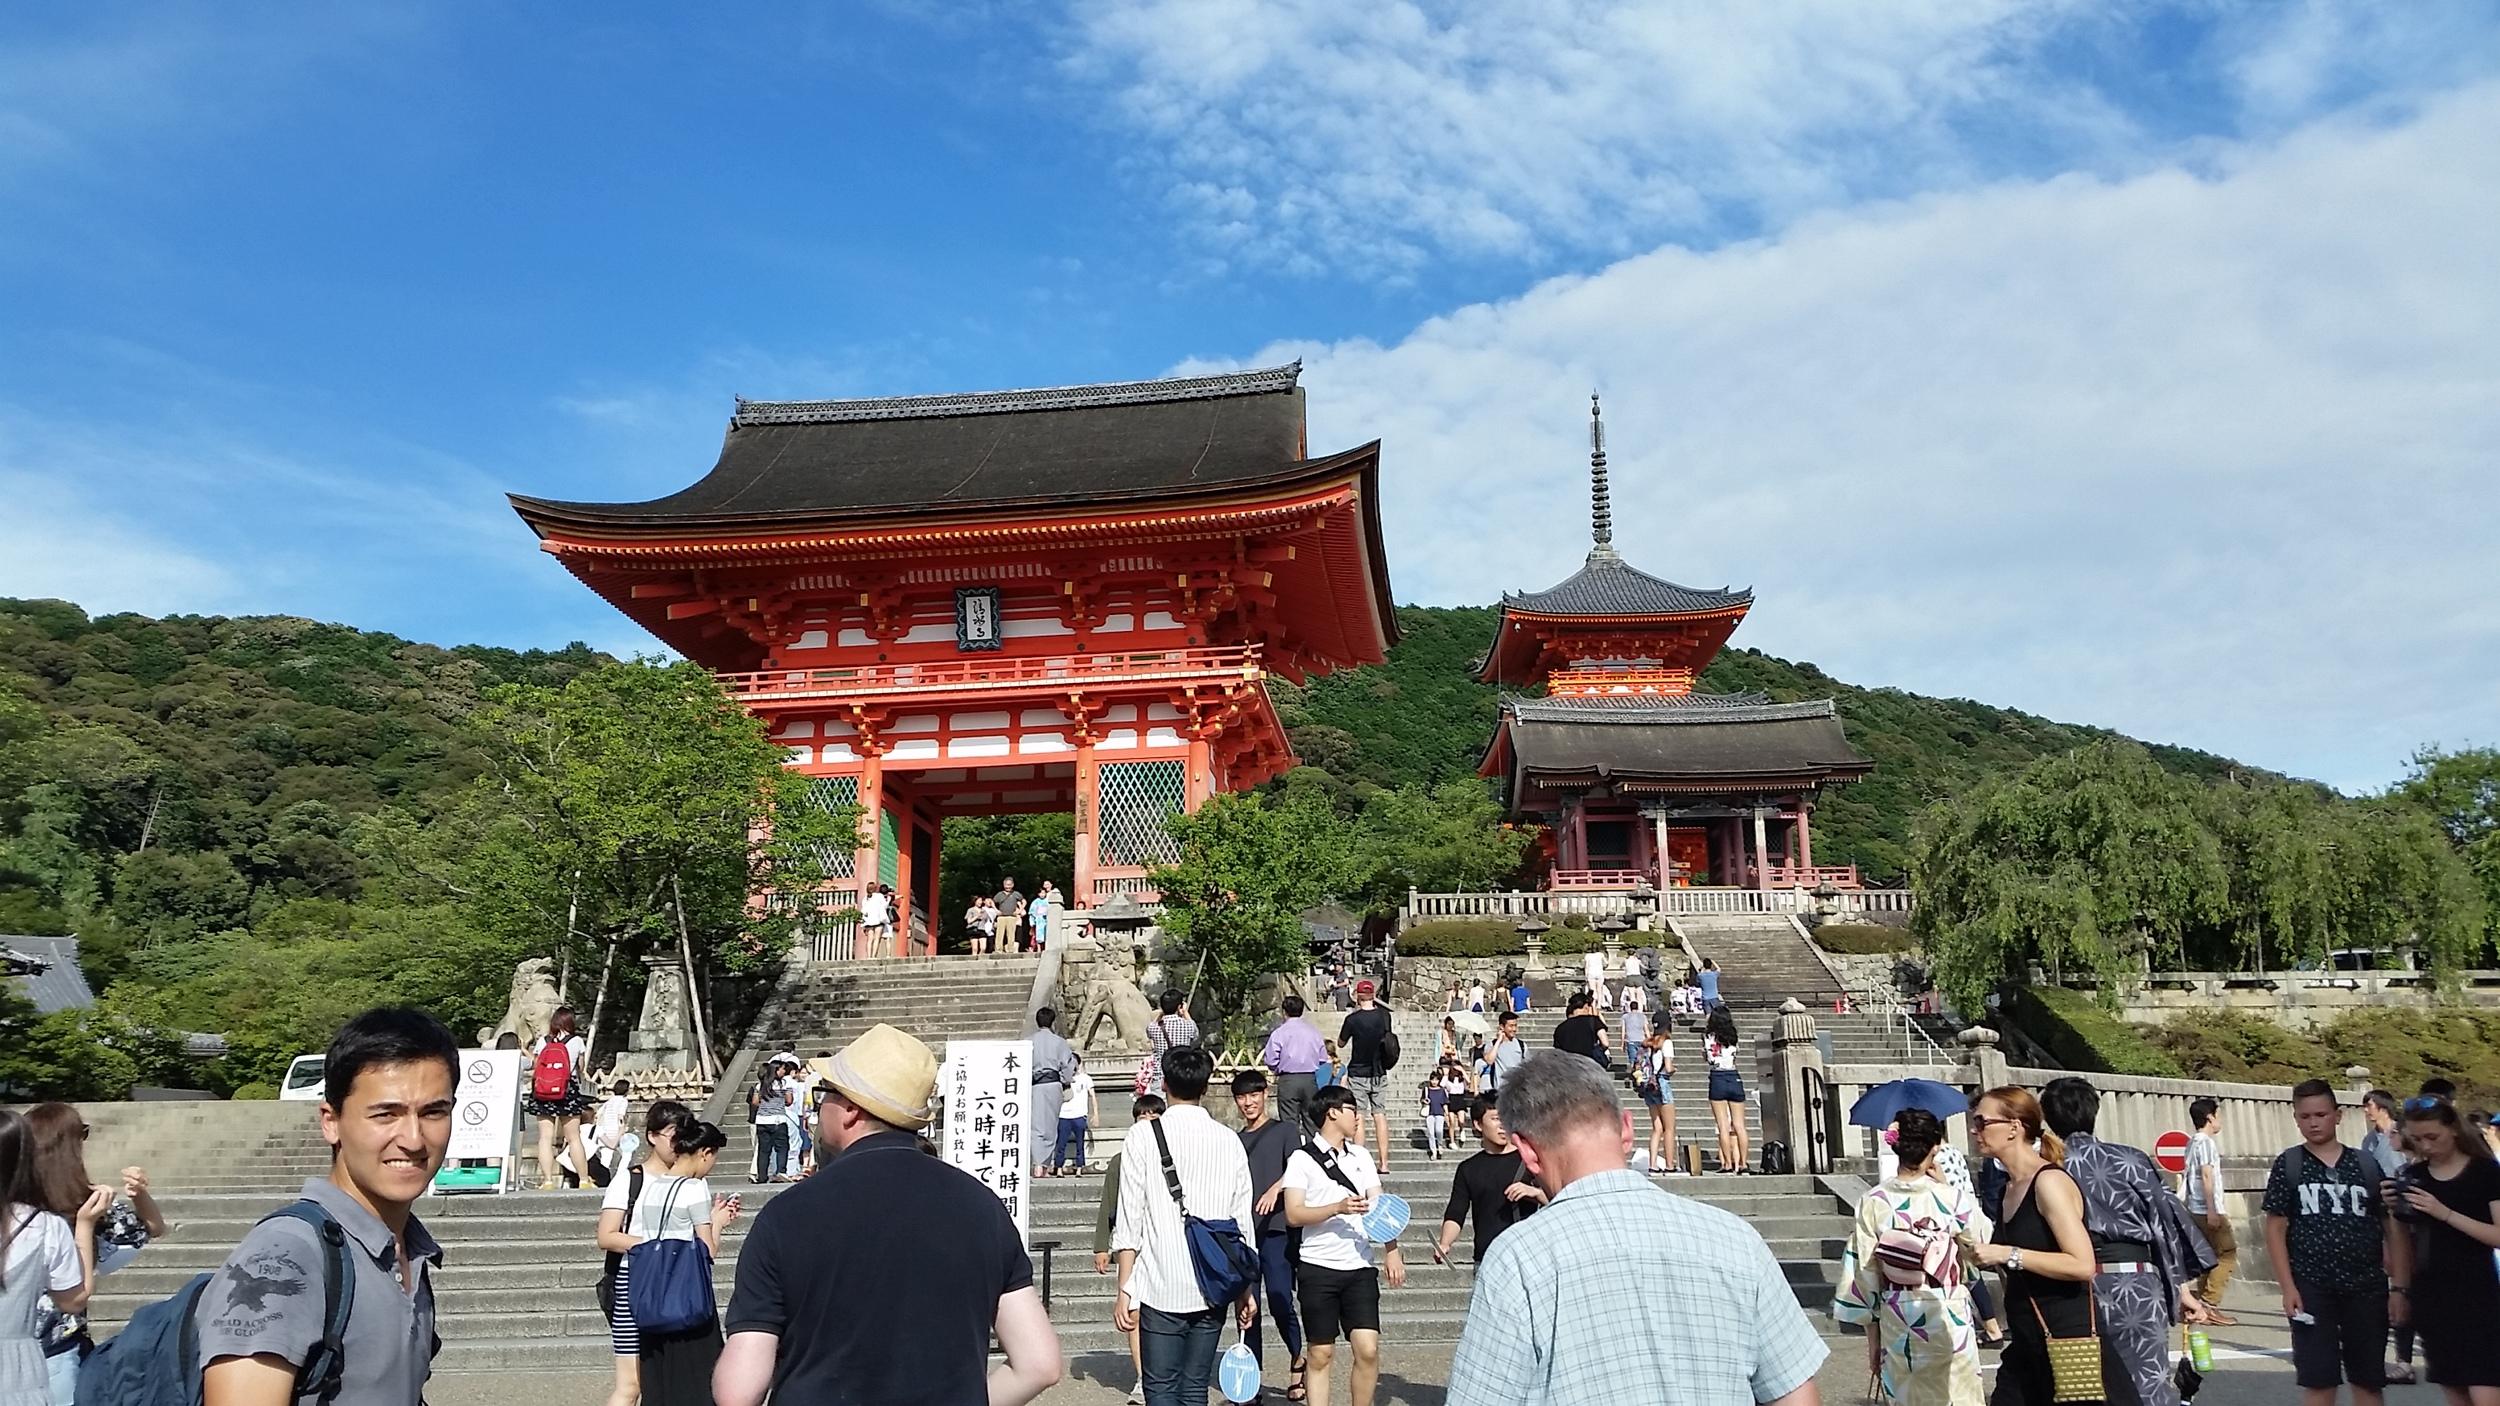 Exploring Kiyomizu-dera, a famous Buddhist temple, on a mountain in Kyoto